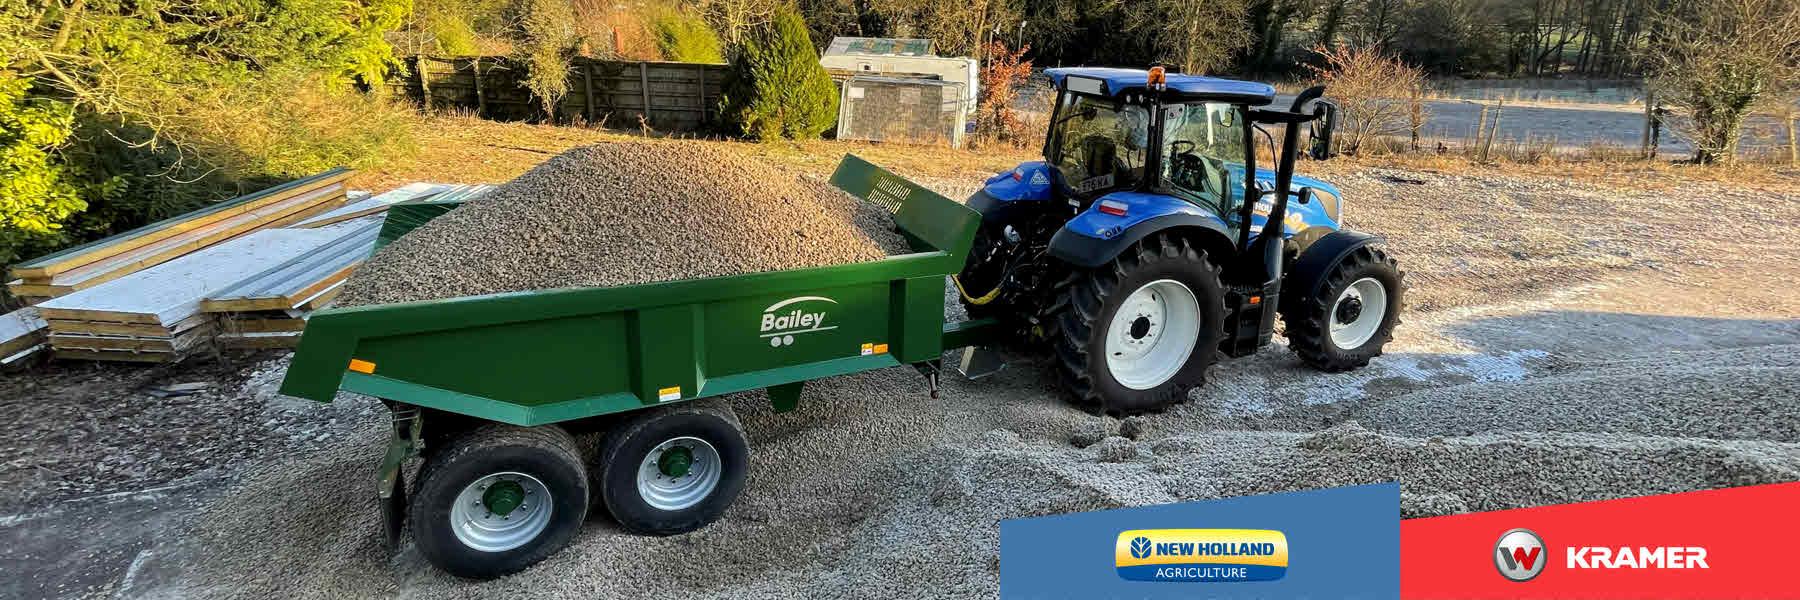 tractor hire lancashire